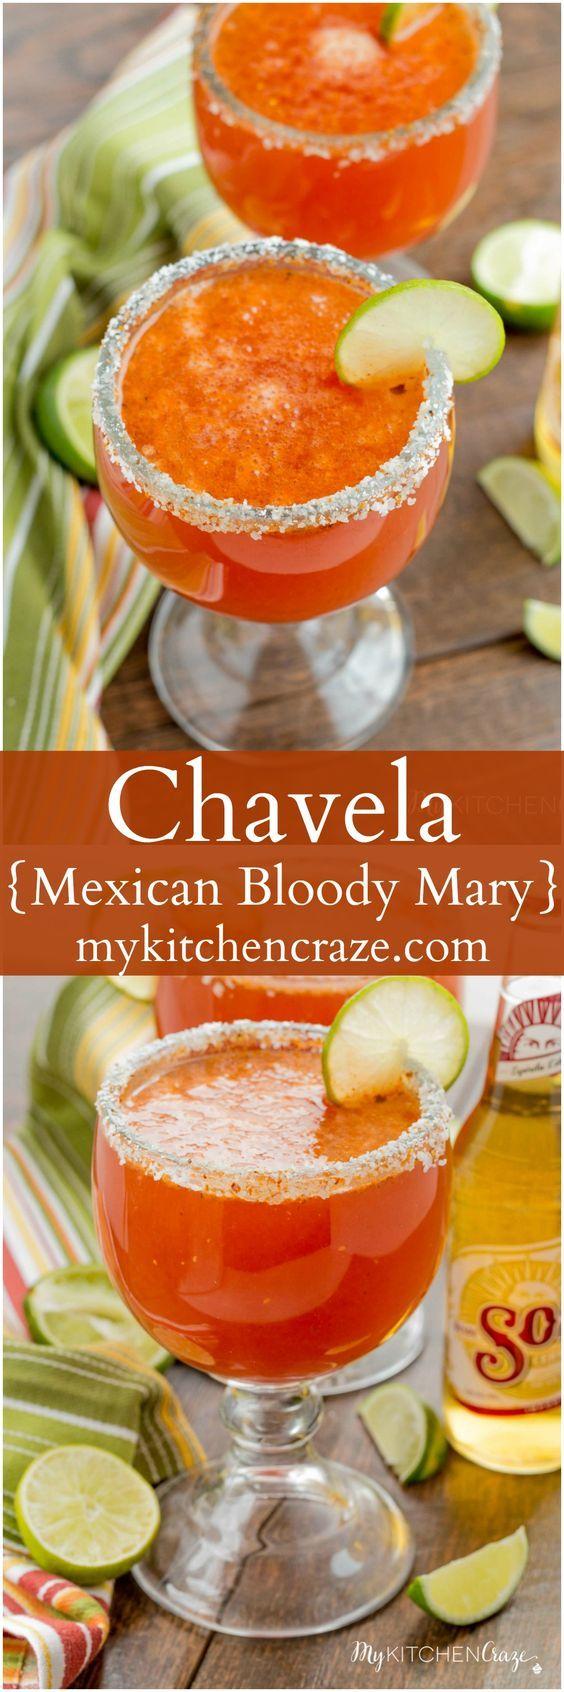 how to make a chavela recipe